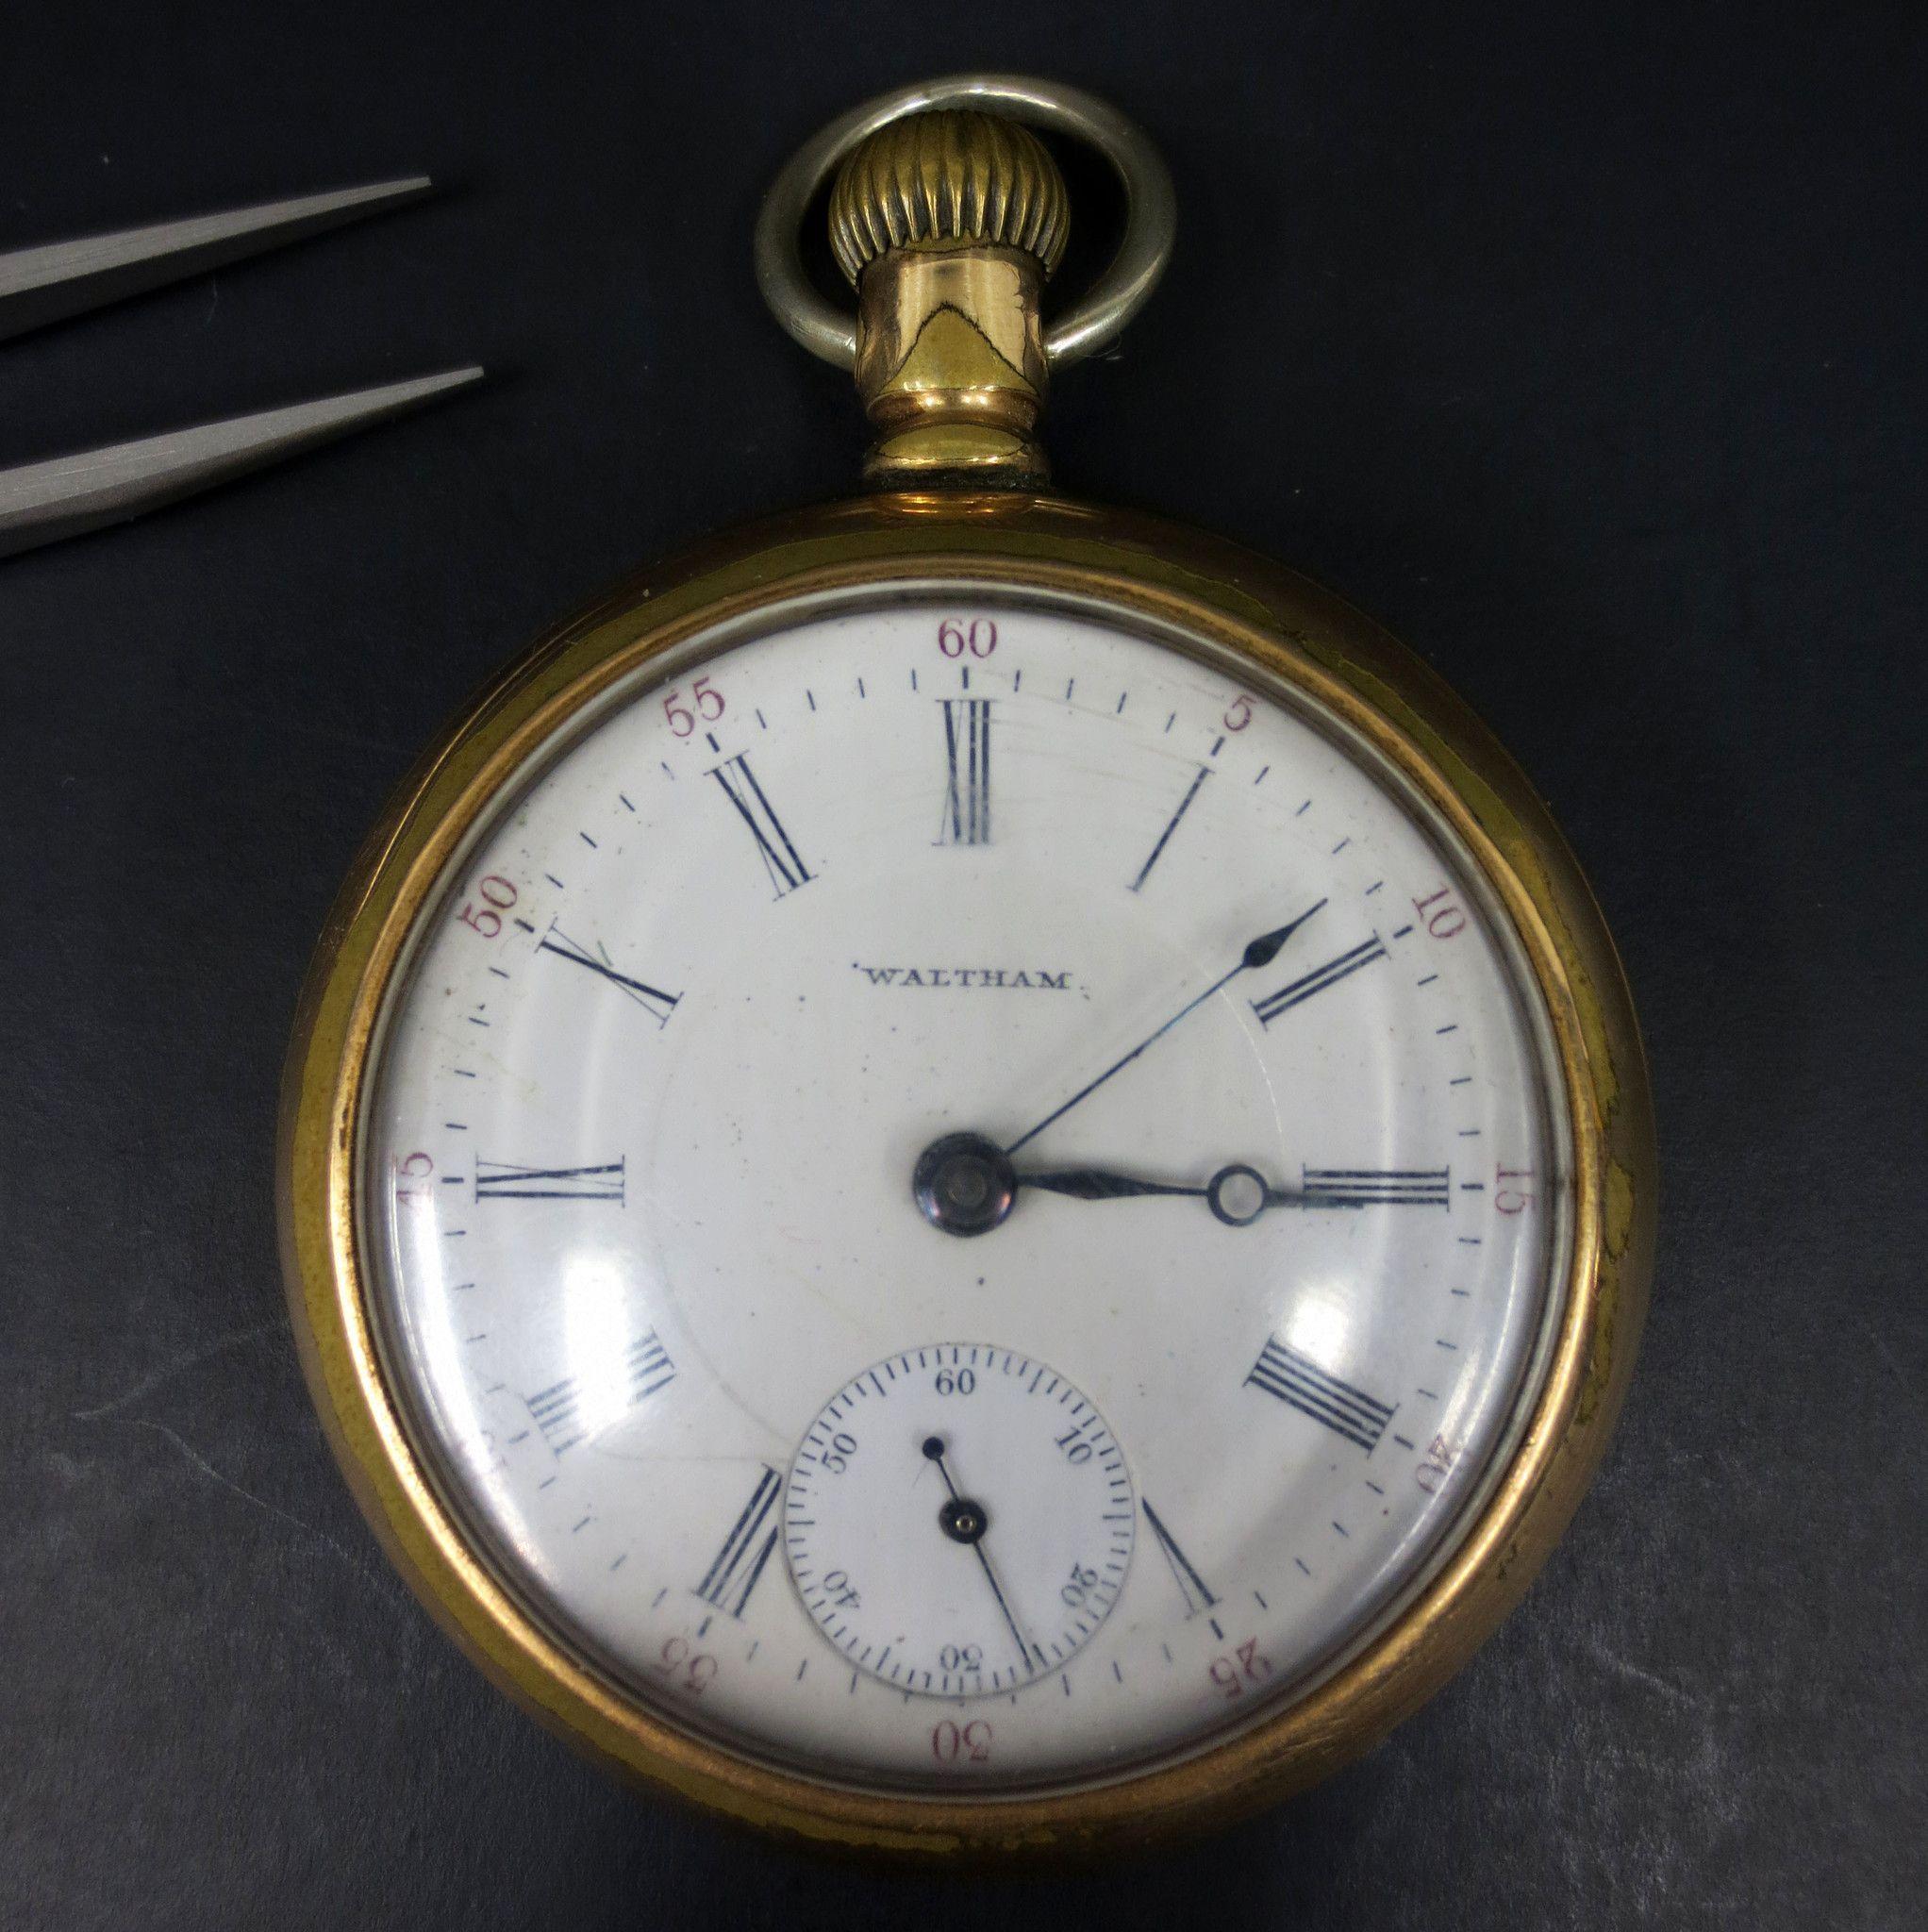 416406919 Antique 1902 Waltham Bartlett Railroad Pocket Watch 17 Jewels Model ...